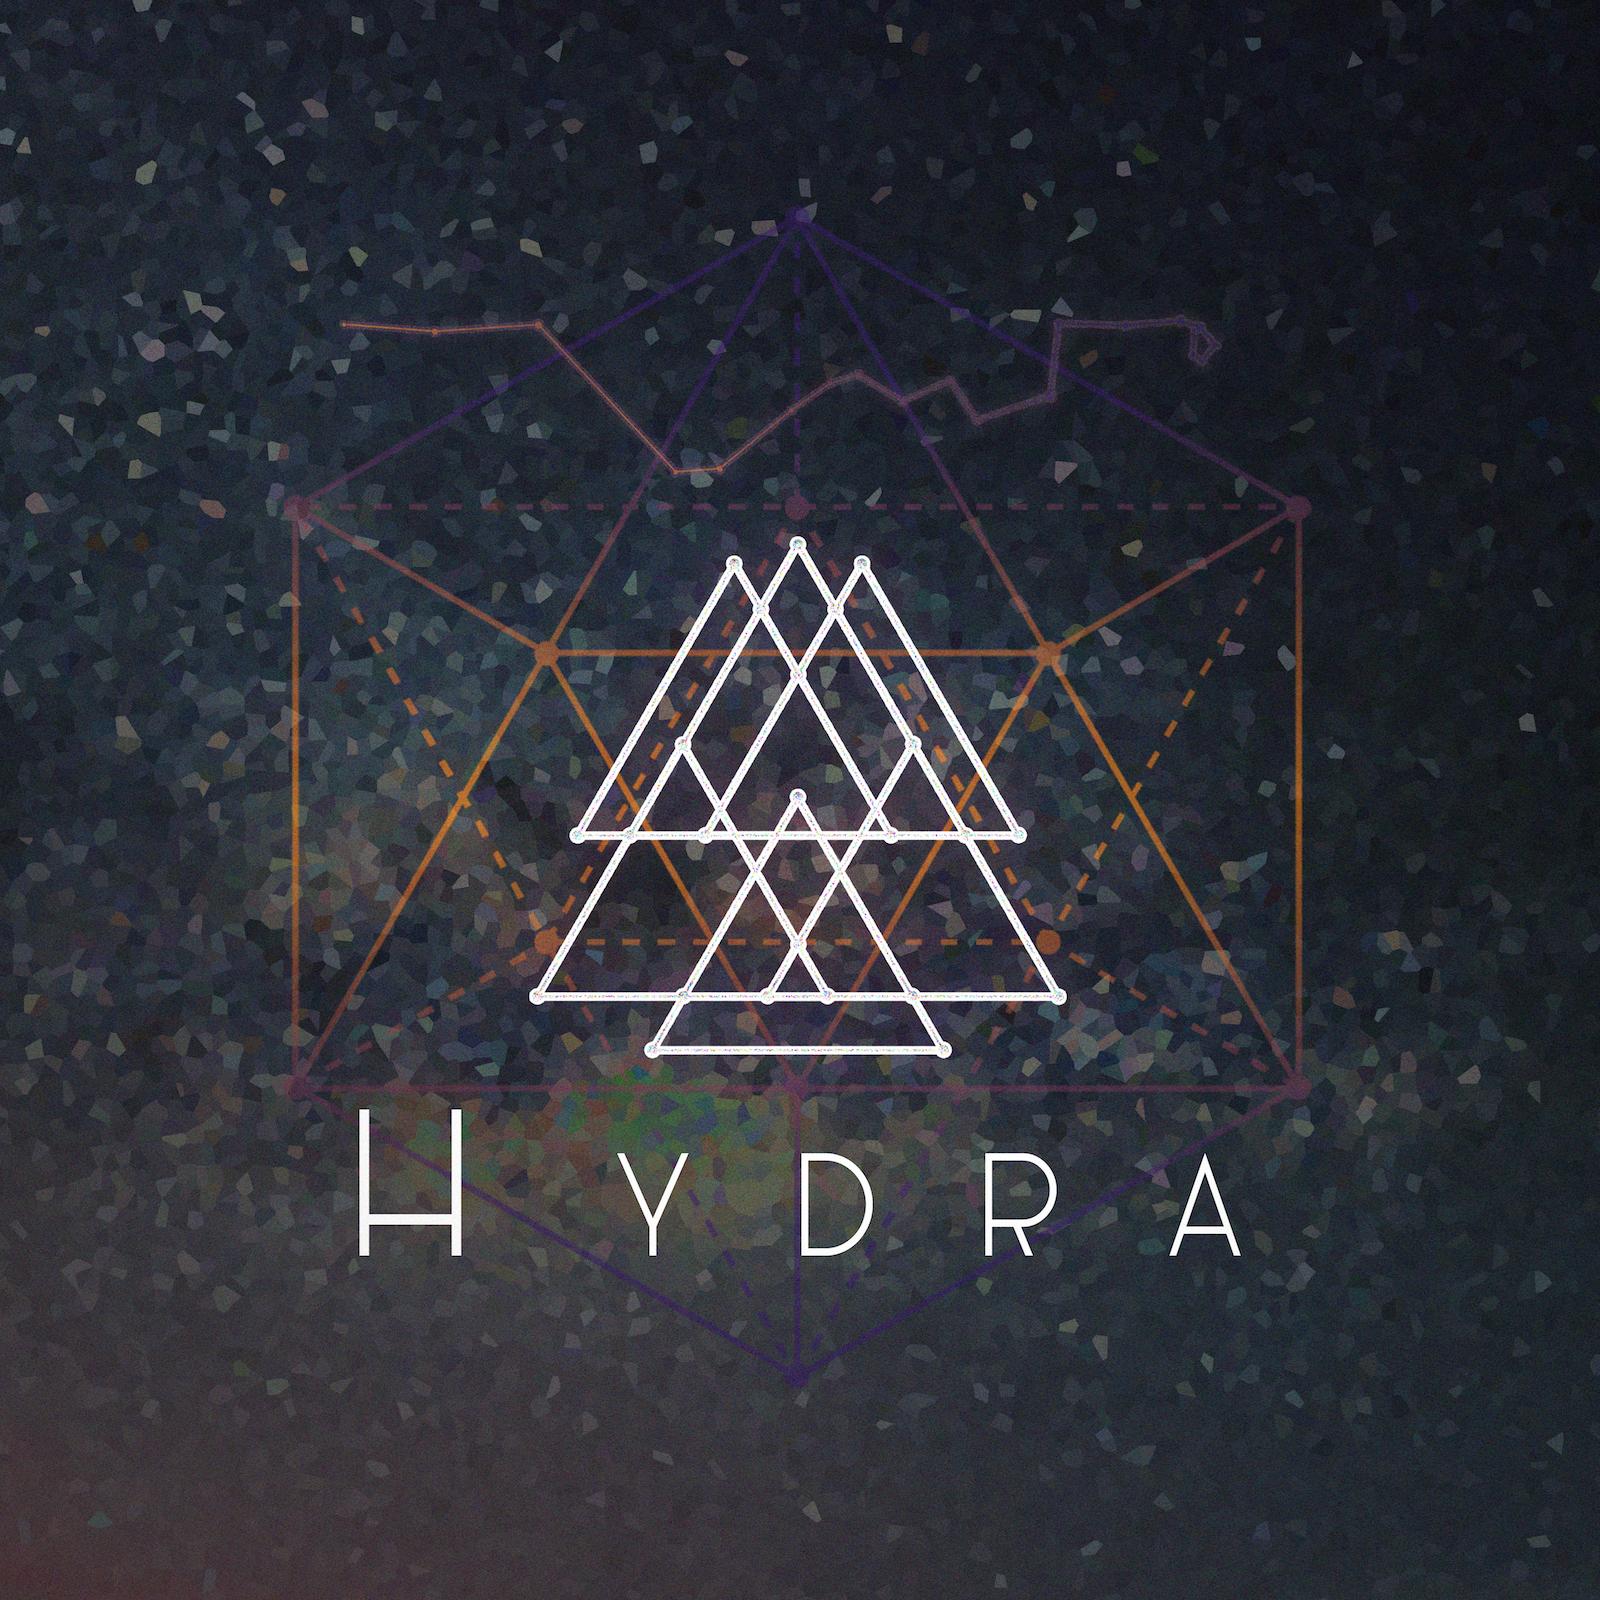 HydraCoverDONE.jpg